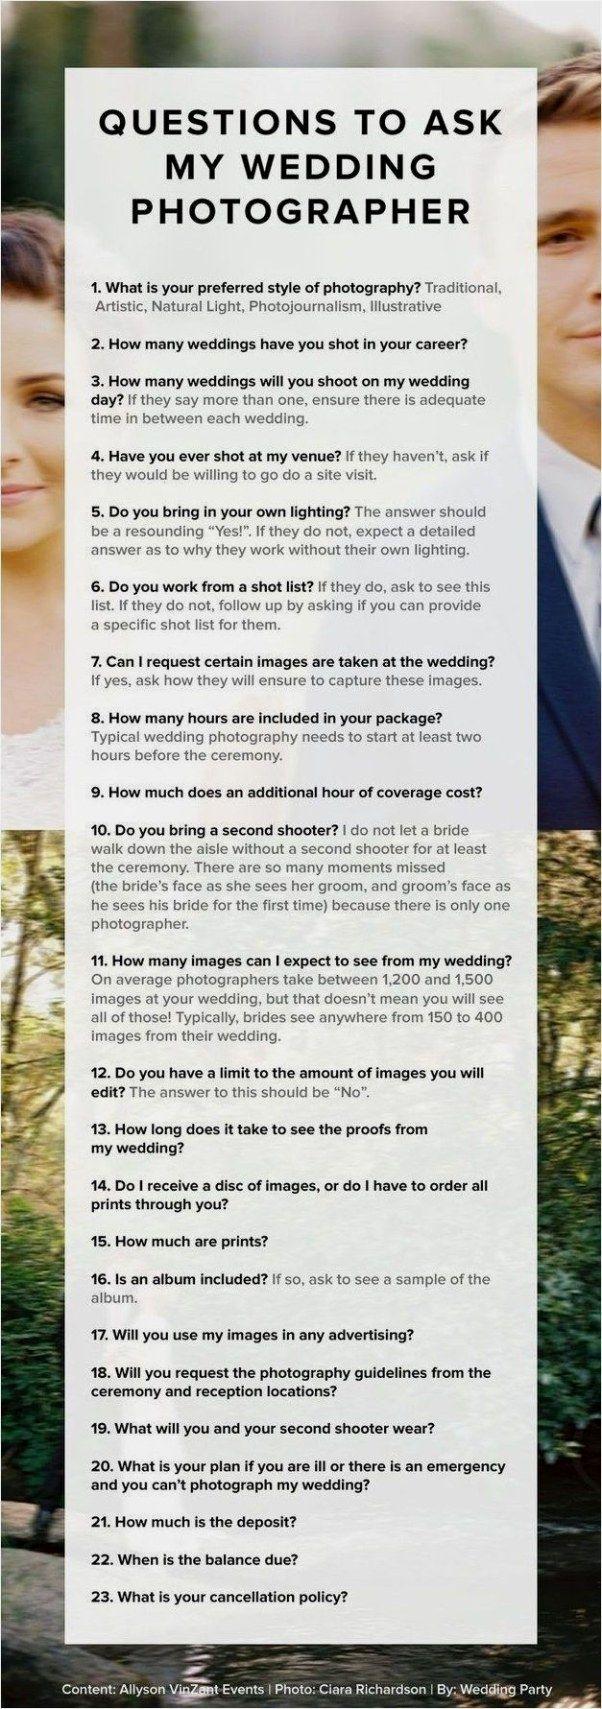 Wedding 4u Weddingring Plan Your Wedding Dream Wedding Wedding Tips